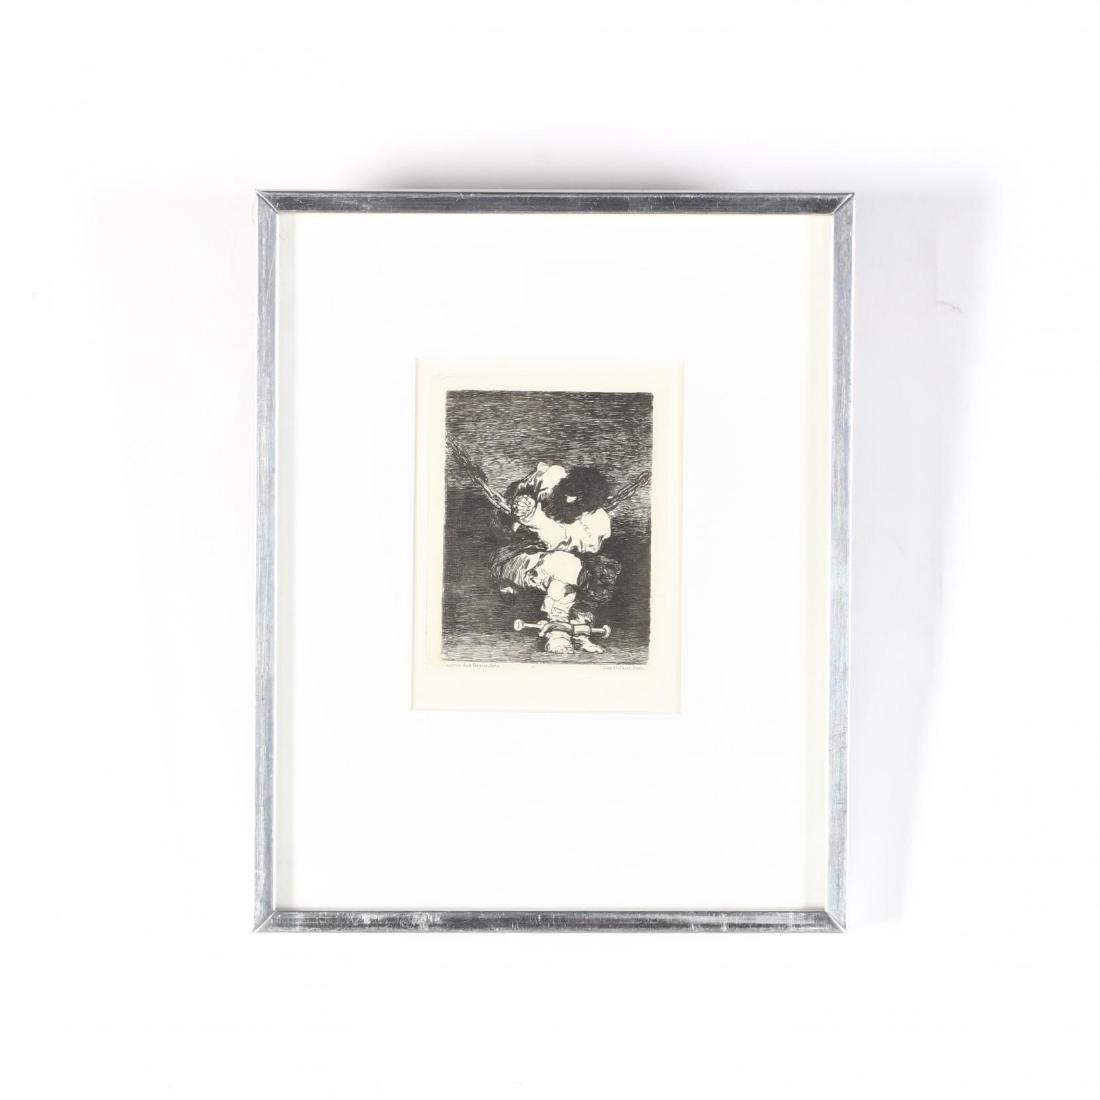 Francisco de Goya (Spanish, 1746-1828),  Tan bárbara